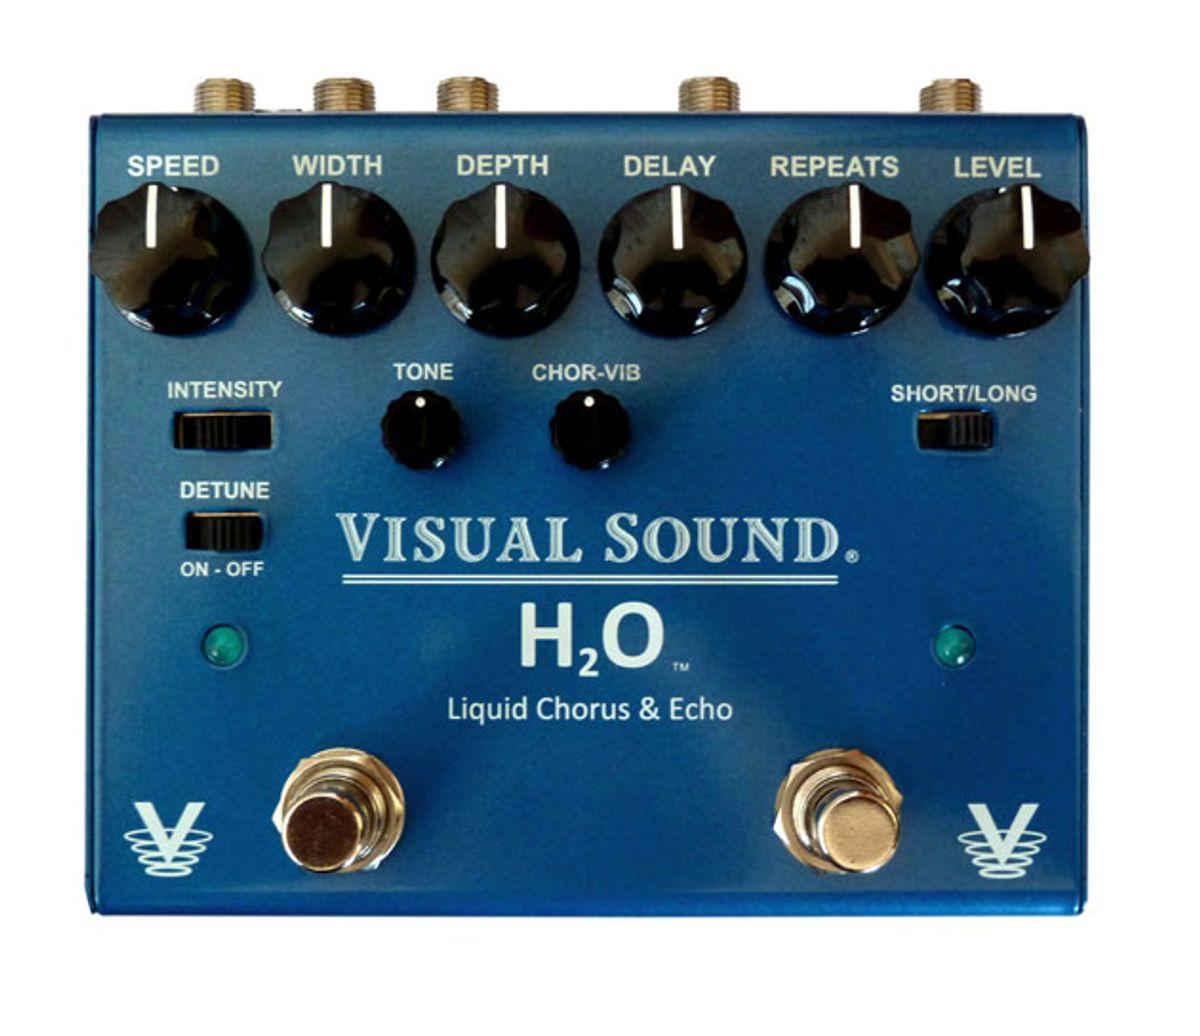 Visual Sound Releases the H20 Liquid Chorus & Echo Pedal